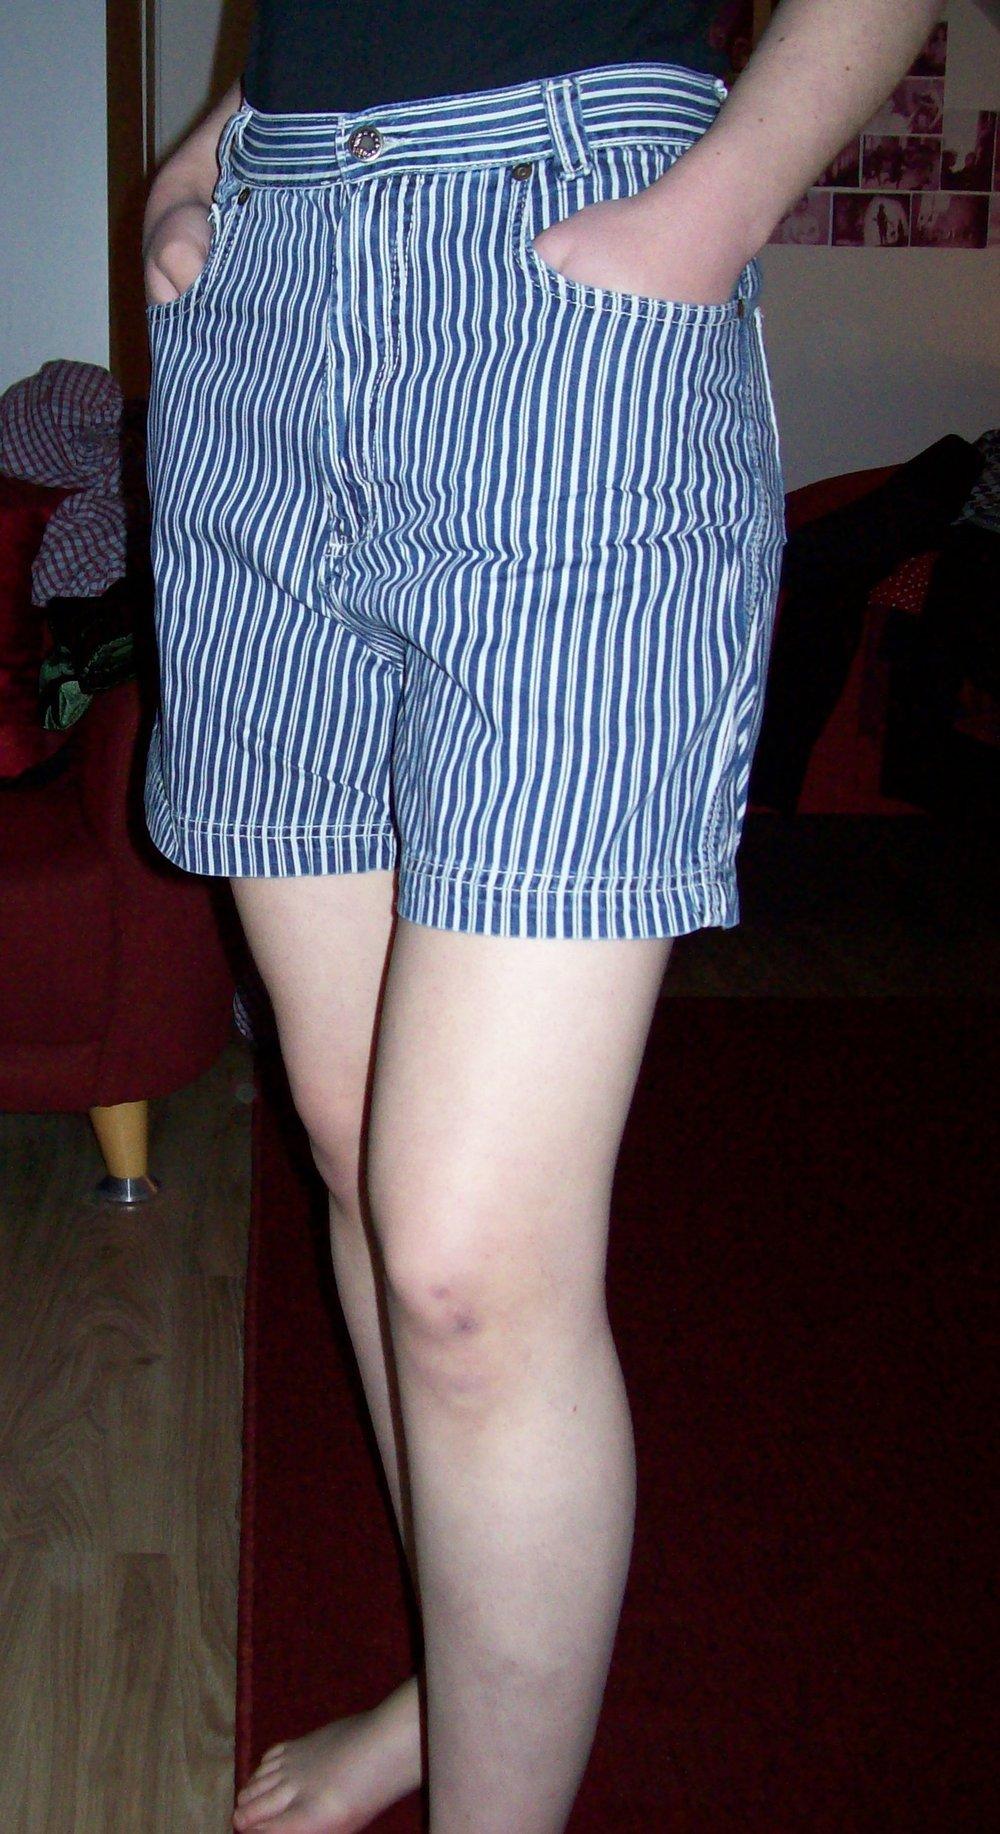 blau wei gestreifte high waist shorts kurze hose hotpansts jeans jeansshorts. Black Bedroom Furniture Sets. Home Design Ideas